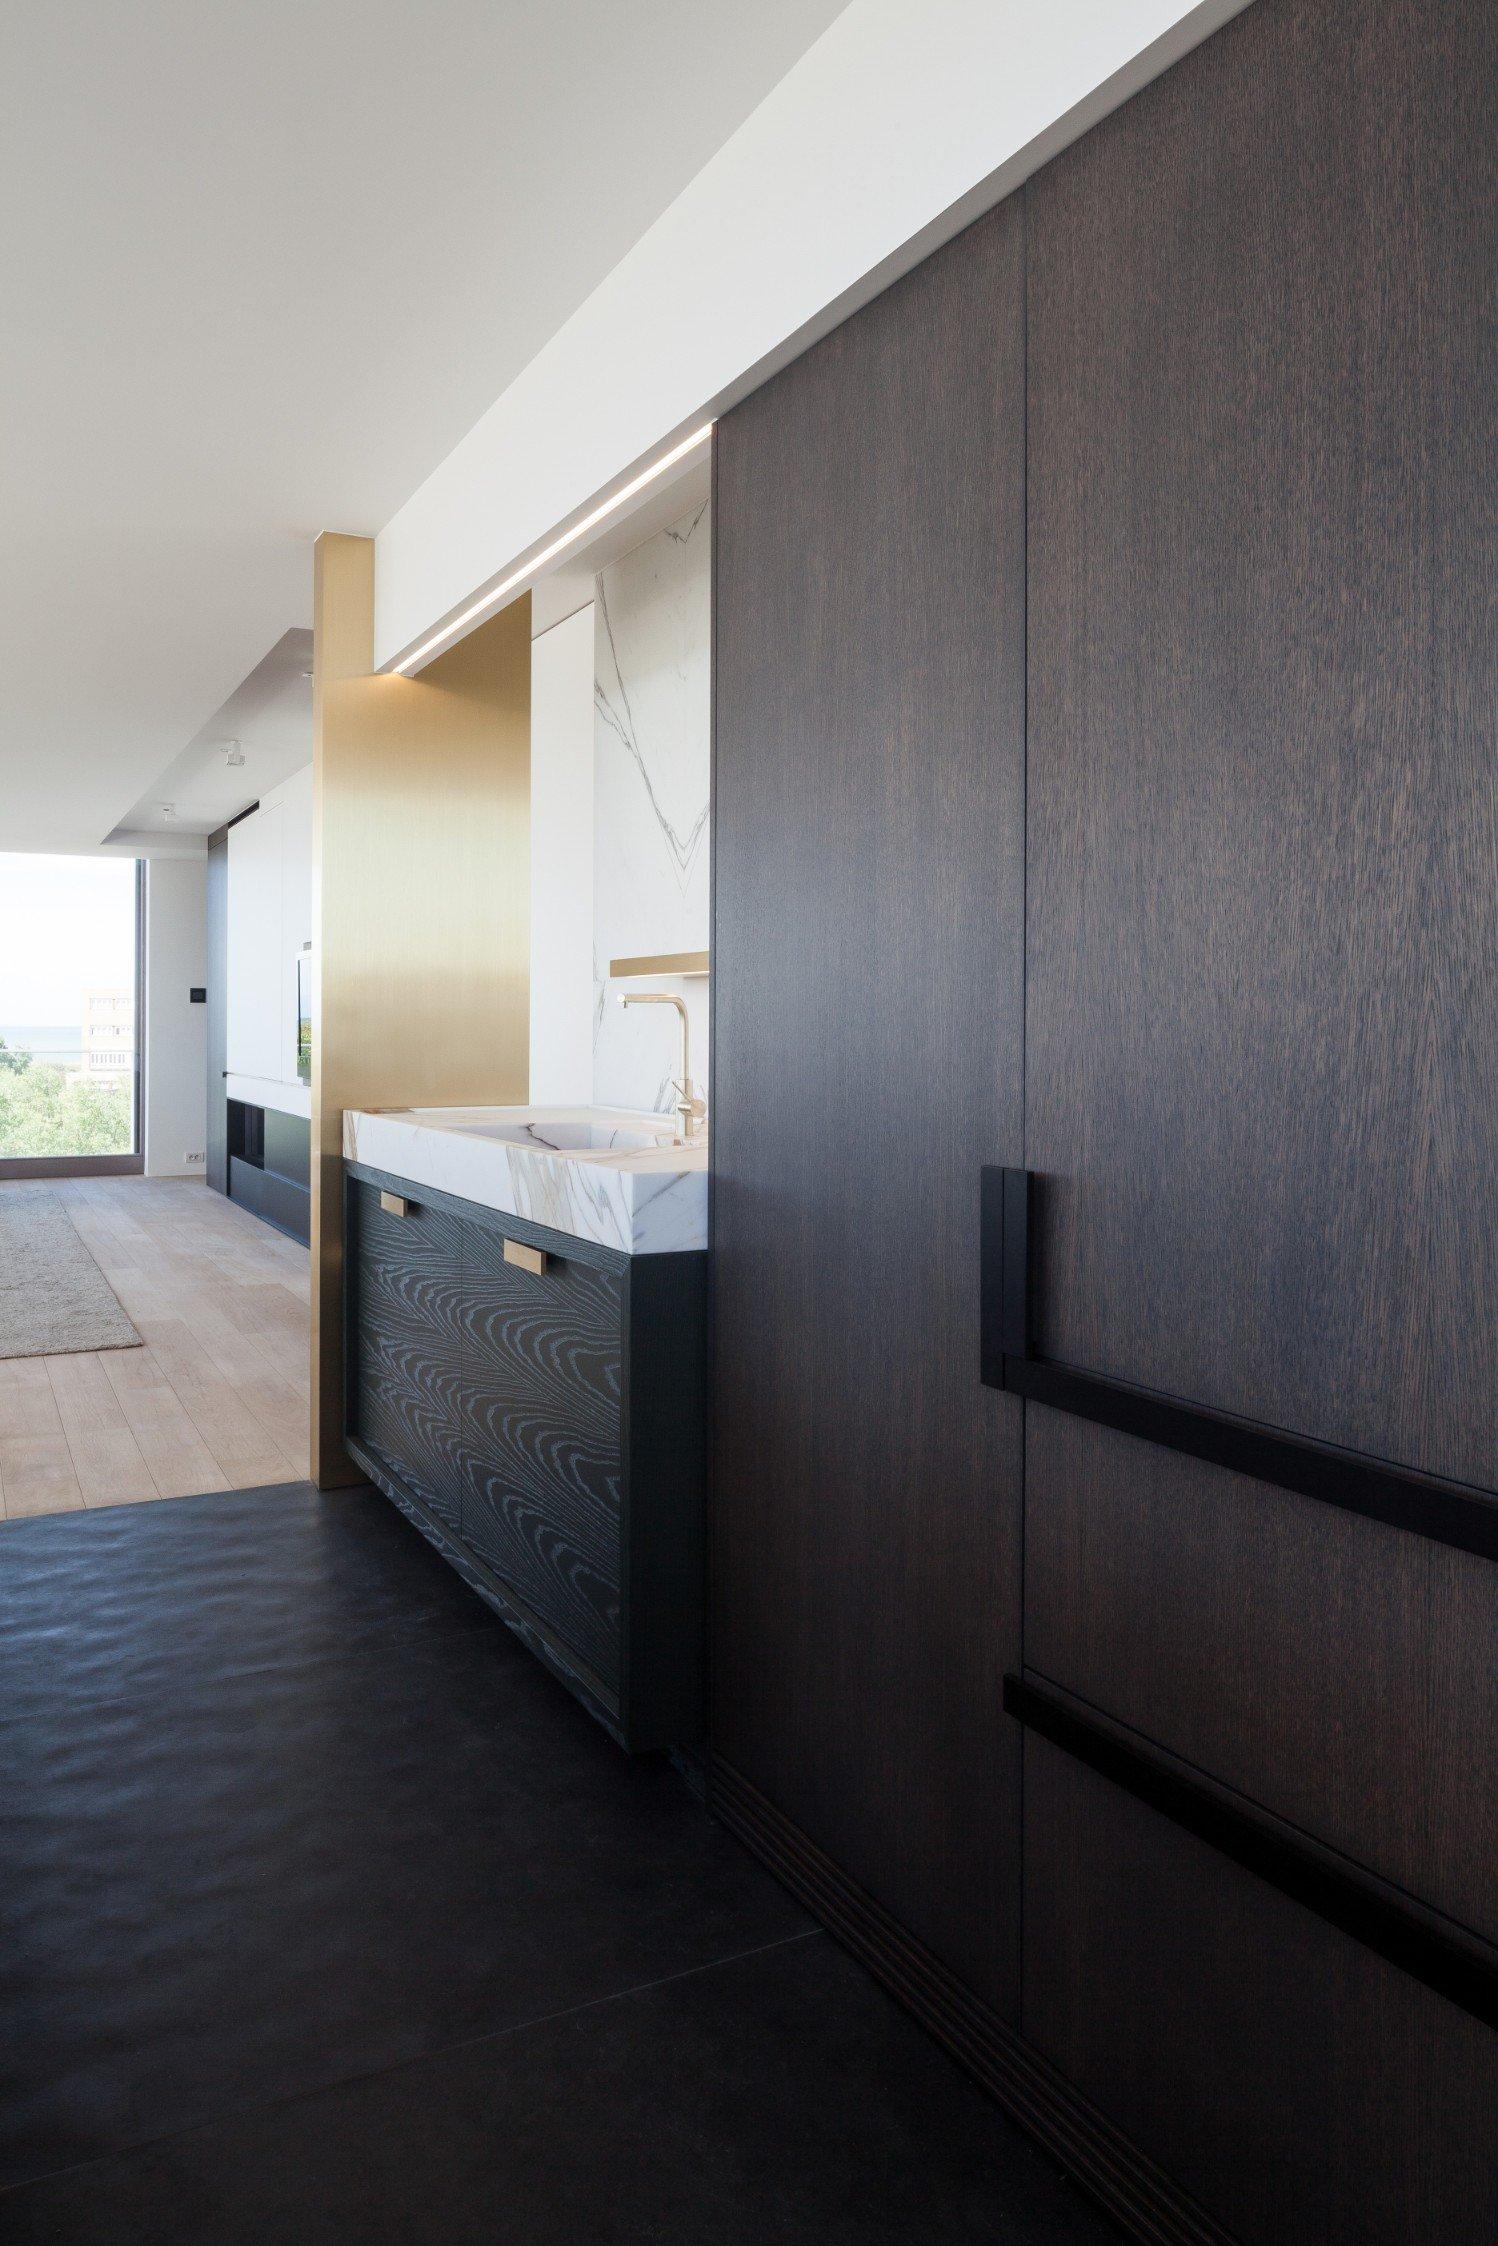 Rietveldprojects-penthouse-appartement-design-architectuur-kust34